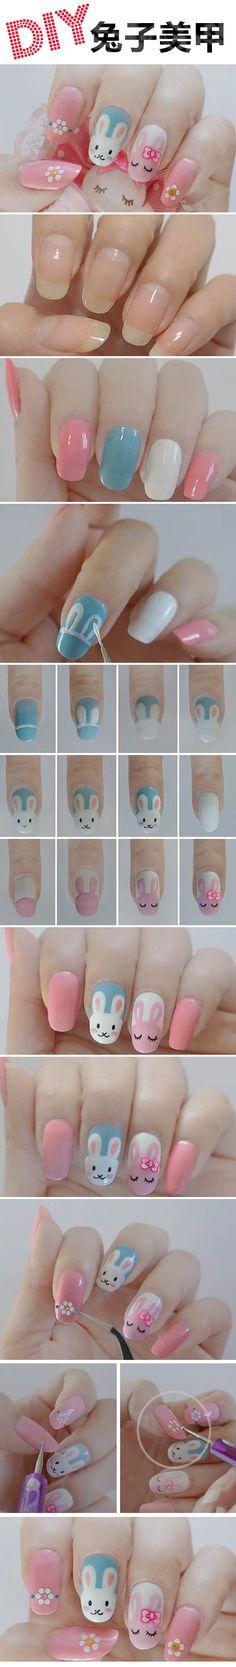 Cute Nails #nail #unhas #unha #nails #unhasdecoradas #nailart #gorgeous #fashion #stylish #lindo #cool #cute #fofo #bunny #coelho